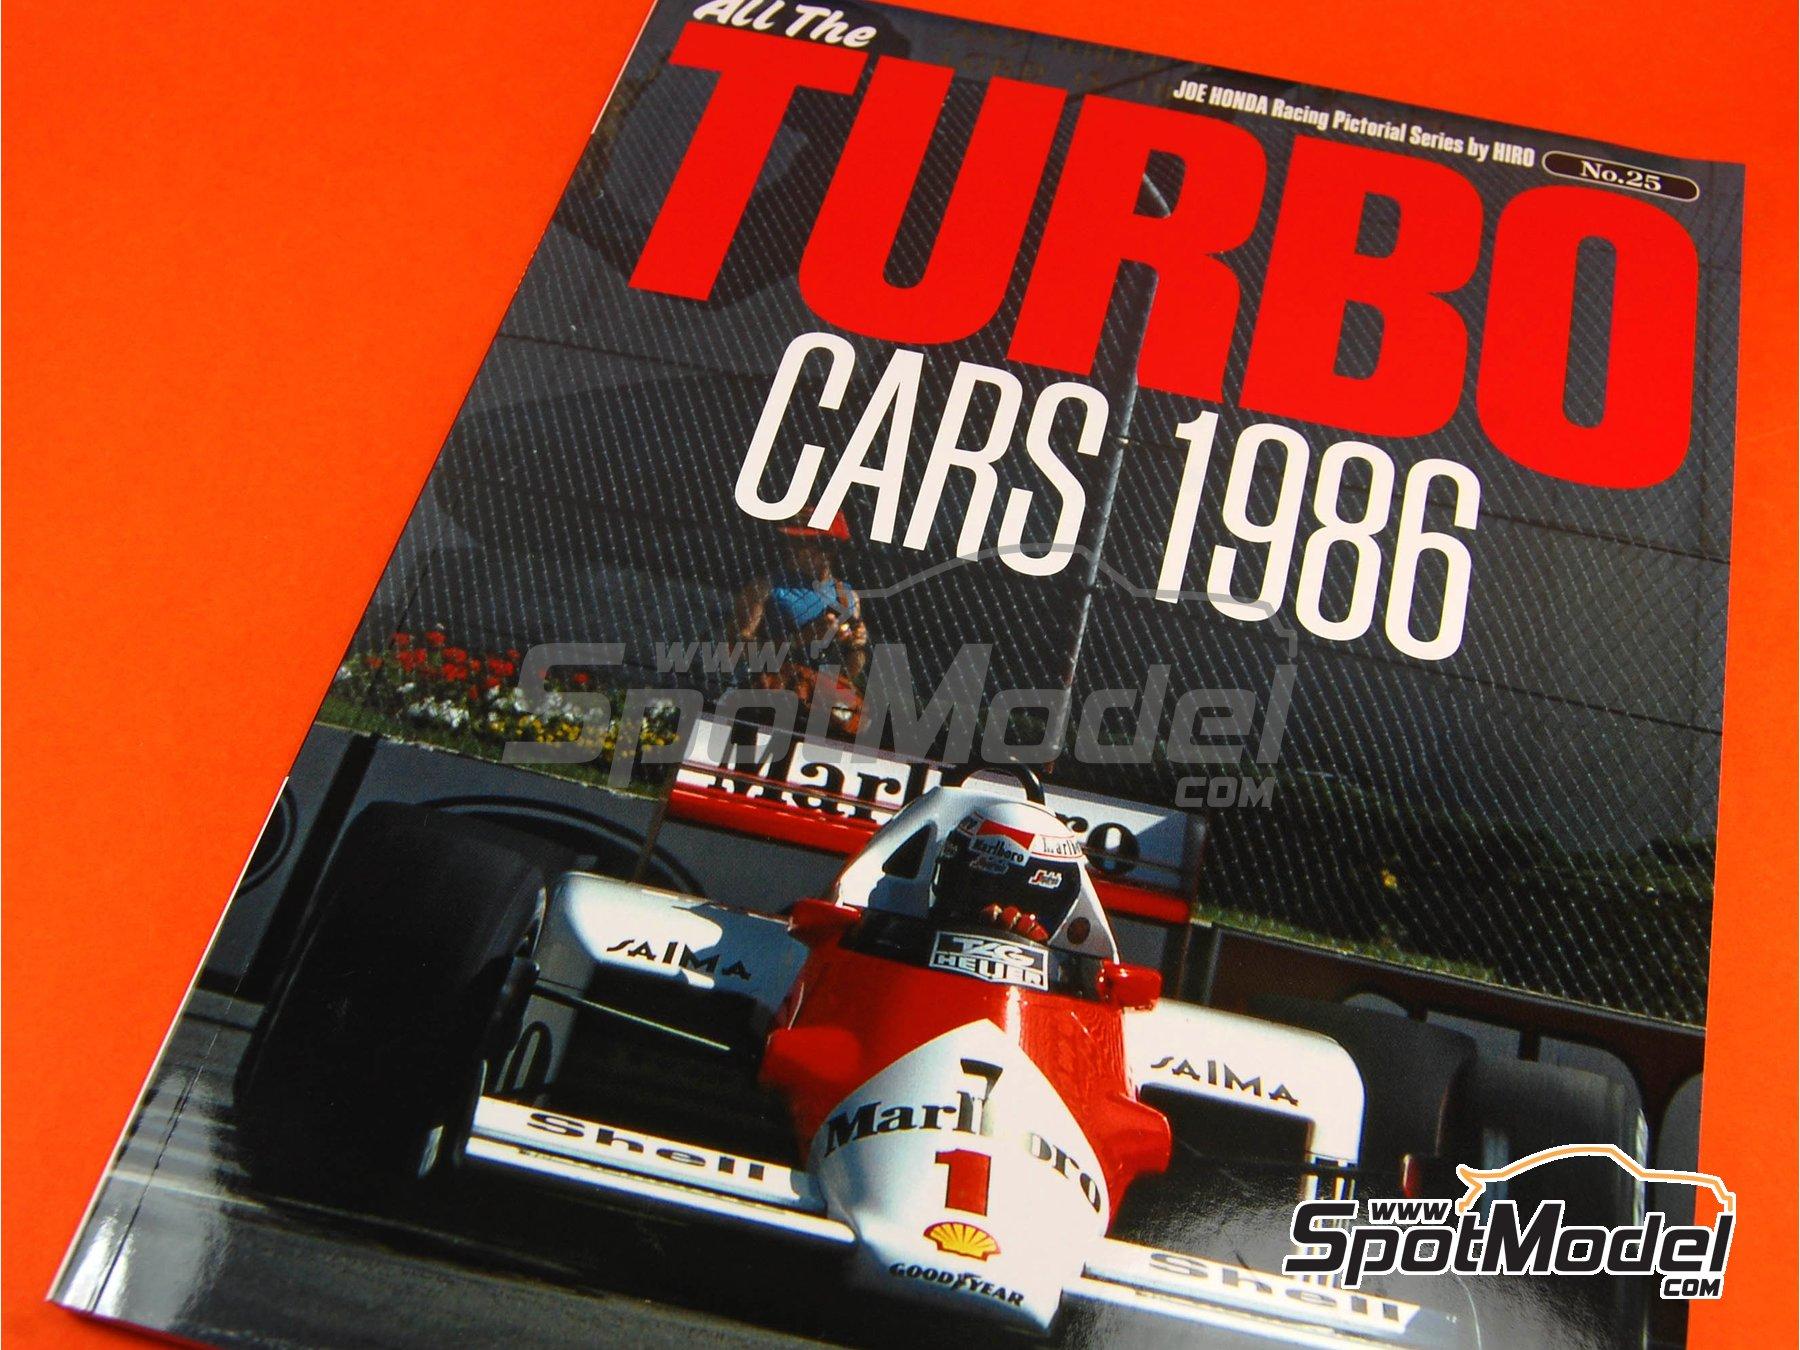 Image 1: JOE HONDA Racing Pictorial Series - All The TURBO CARS -  1986 | Libro de referencia fabricado por Model Factory Hiro (ref.MFH-JH25)